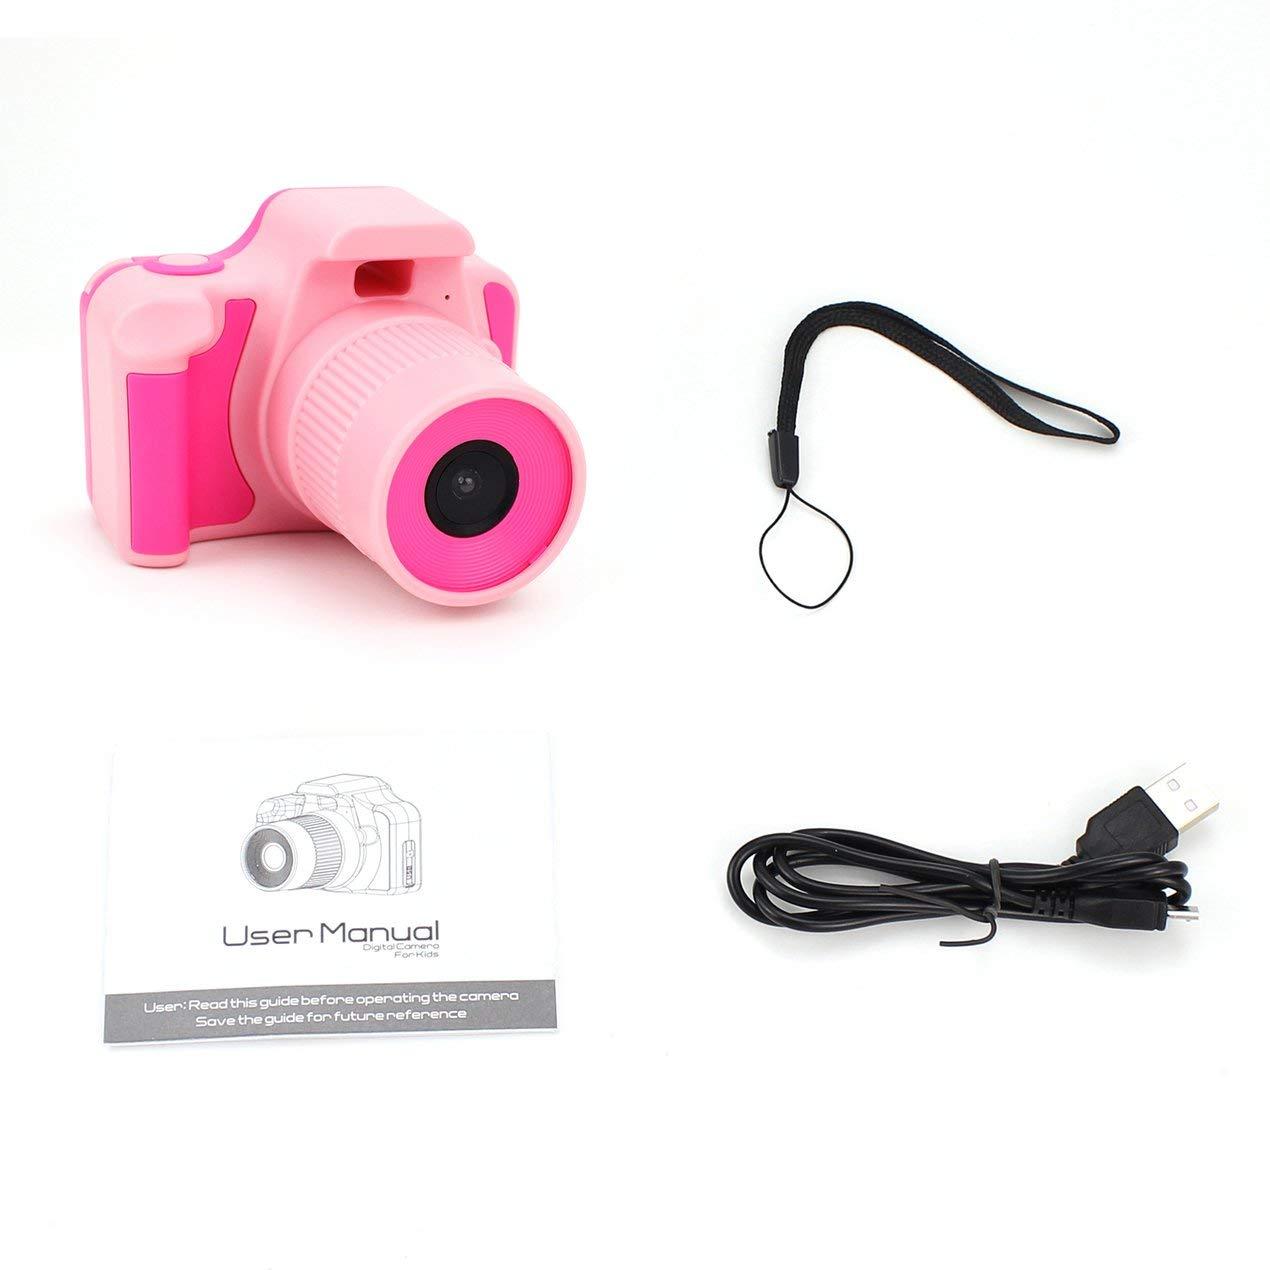 Videocamera Full HD 1080P D10 Digital schermo LCD da 2 pollici bambini Mini DV Dooret